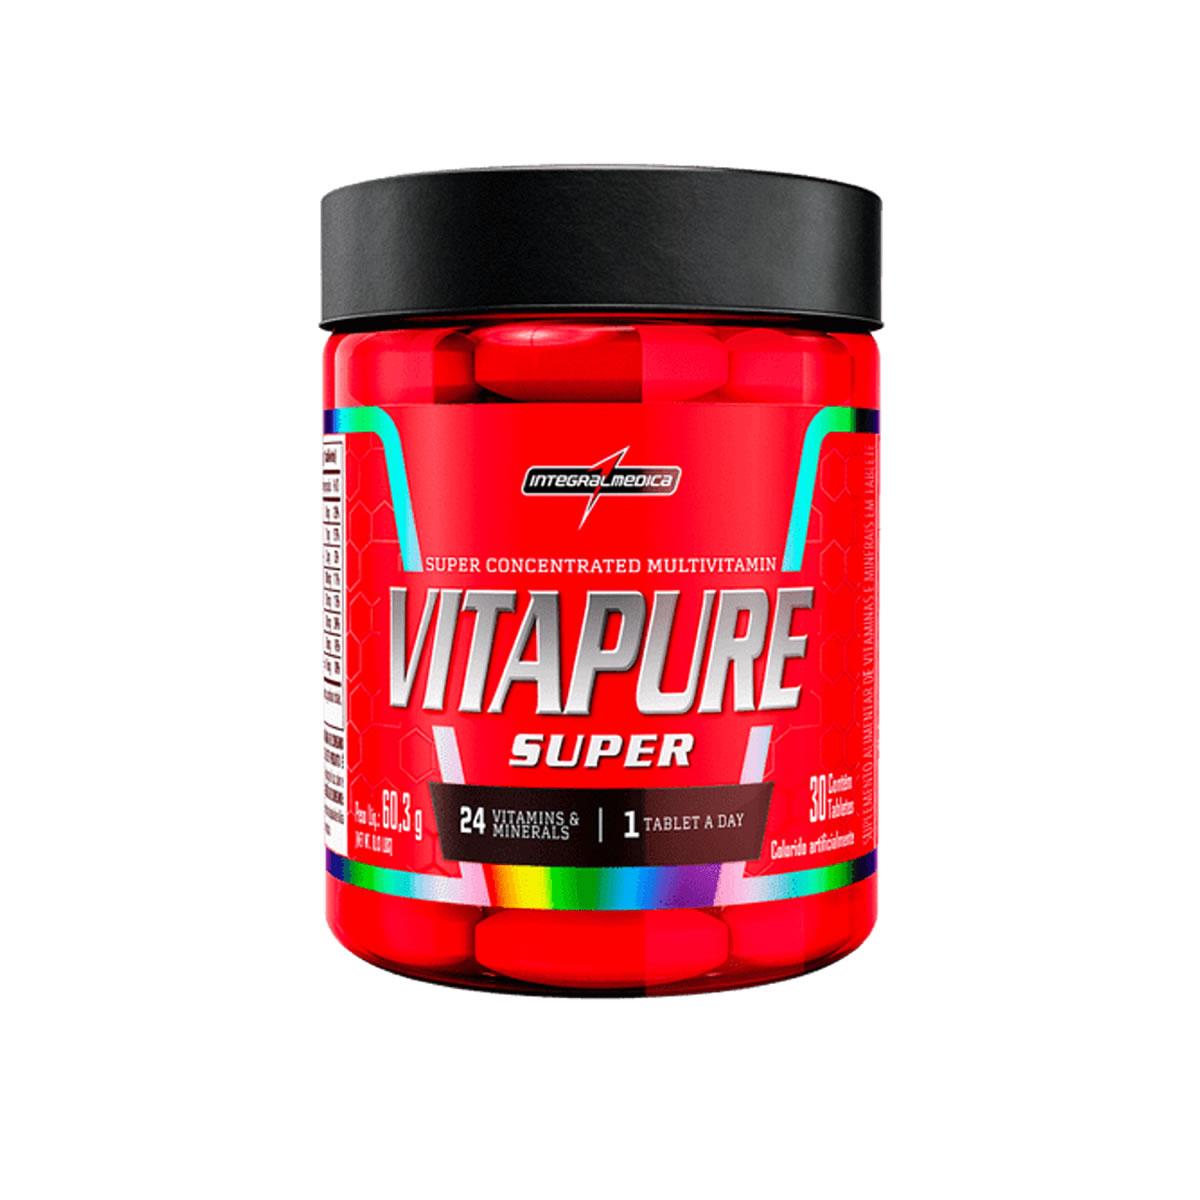 Vitapure Super 2g 30 Tabletes - IntegralMedica